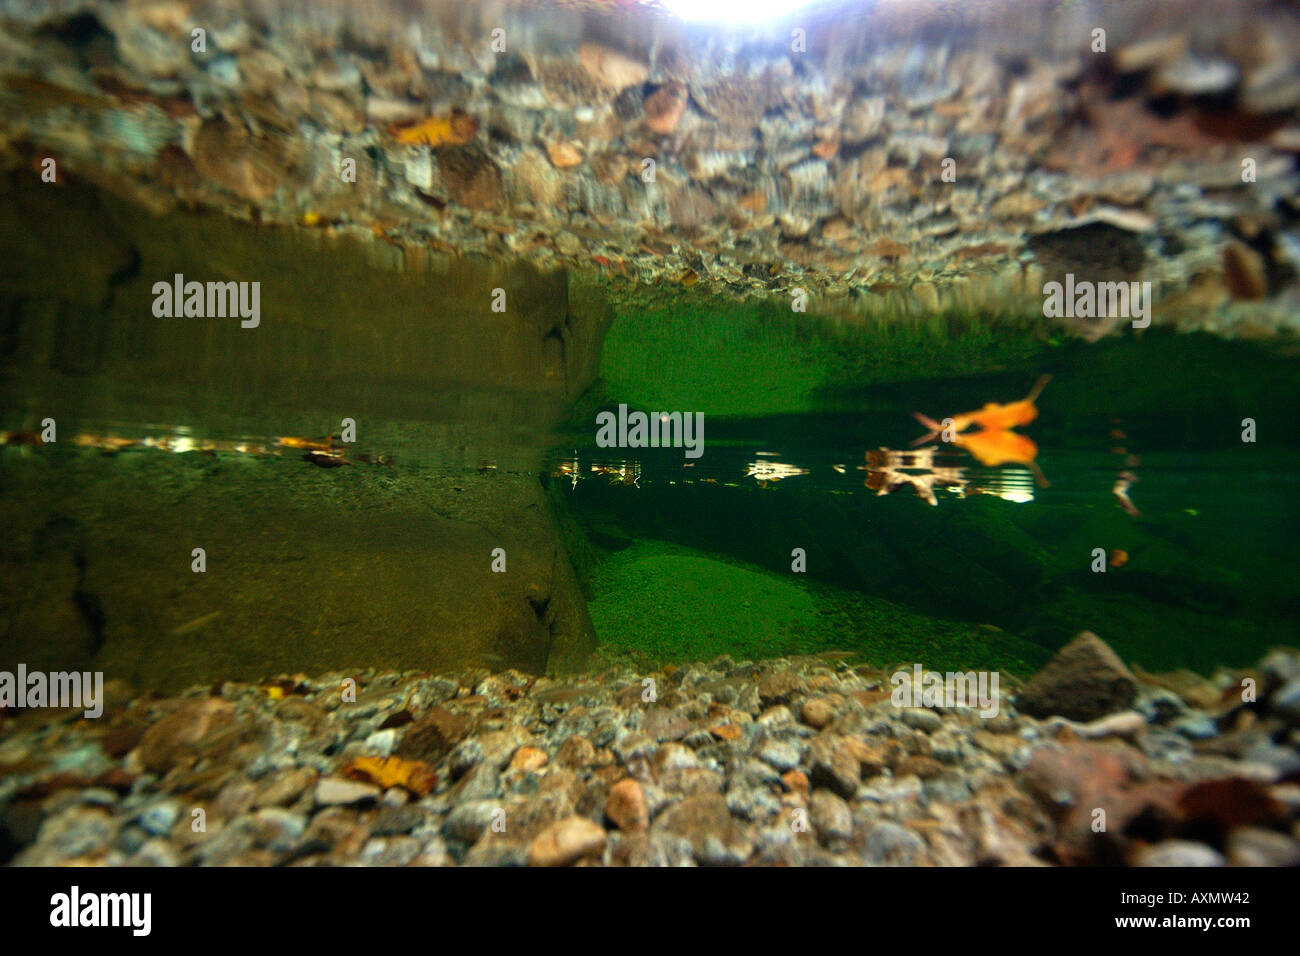 Freshwater fish korea - Stock Photo Surface Reflection In Natural Freshwater Seoraksan National Park Gangwon Province South Korea